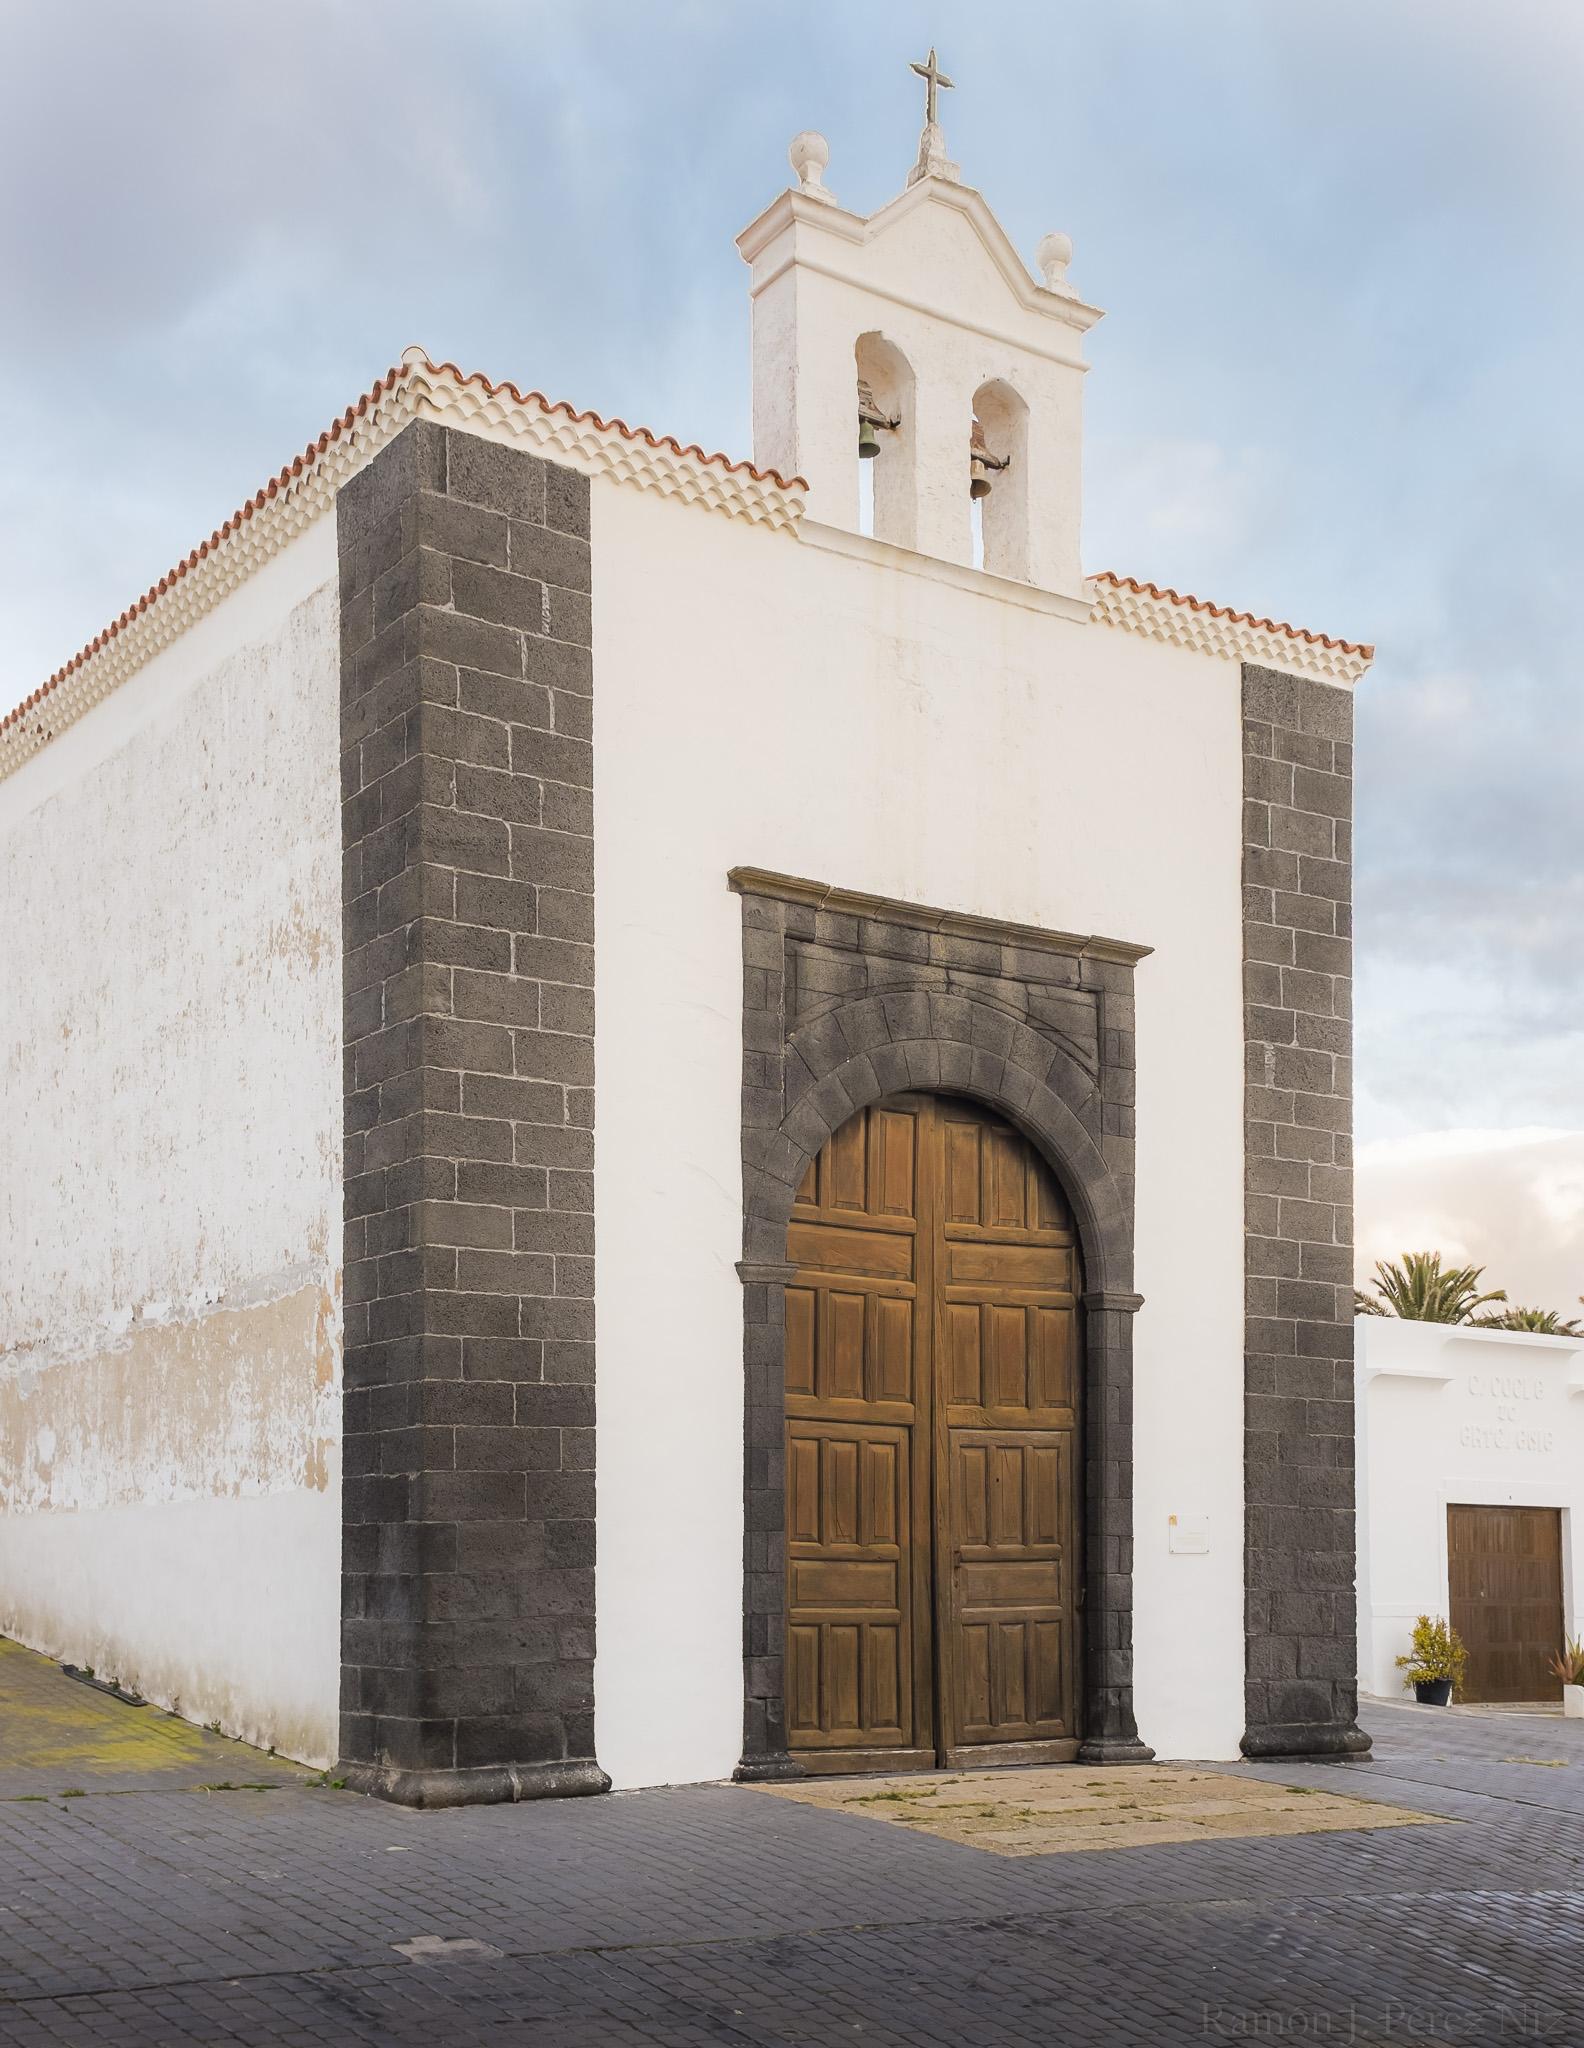 La ermita de Vera Cruz, Teguise, fotografía por Ramón Pérez Niz